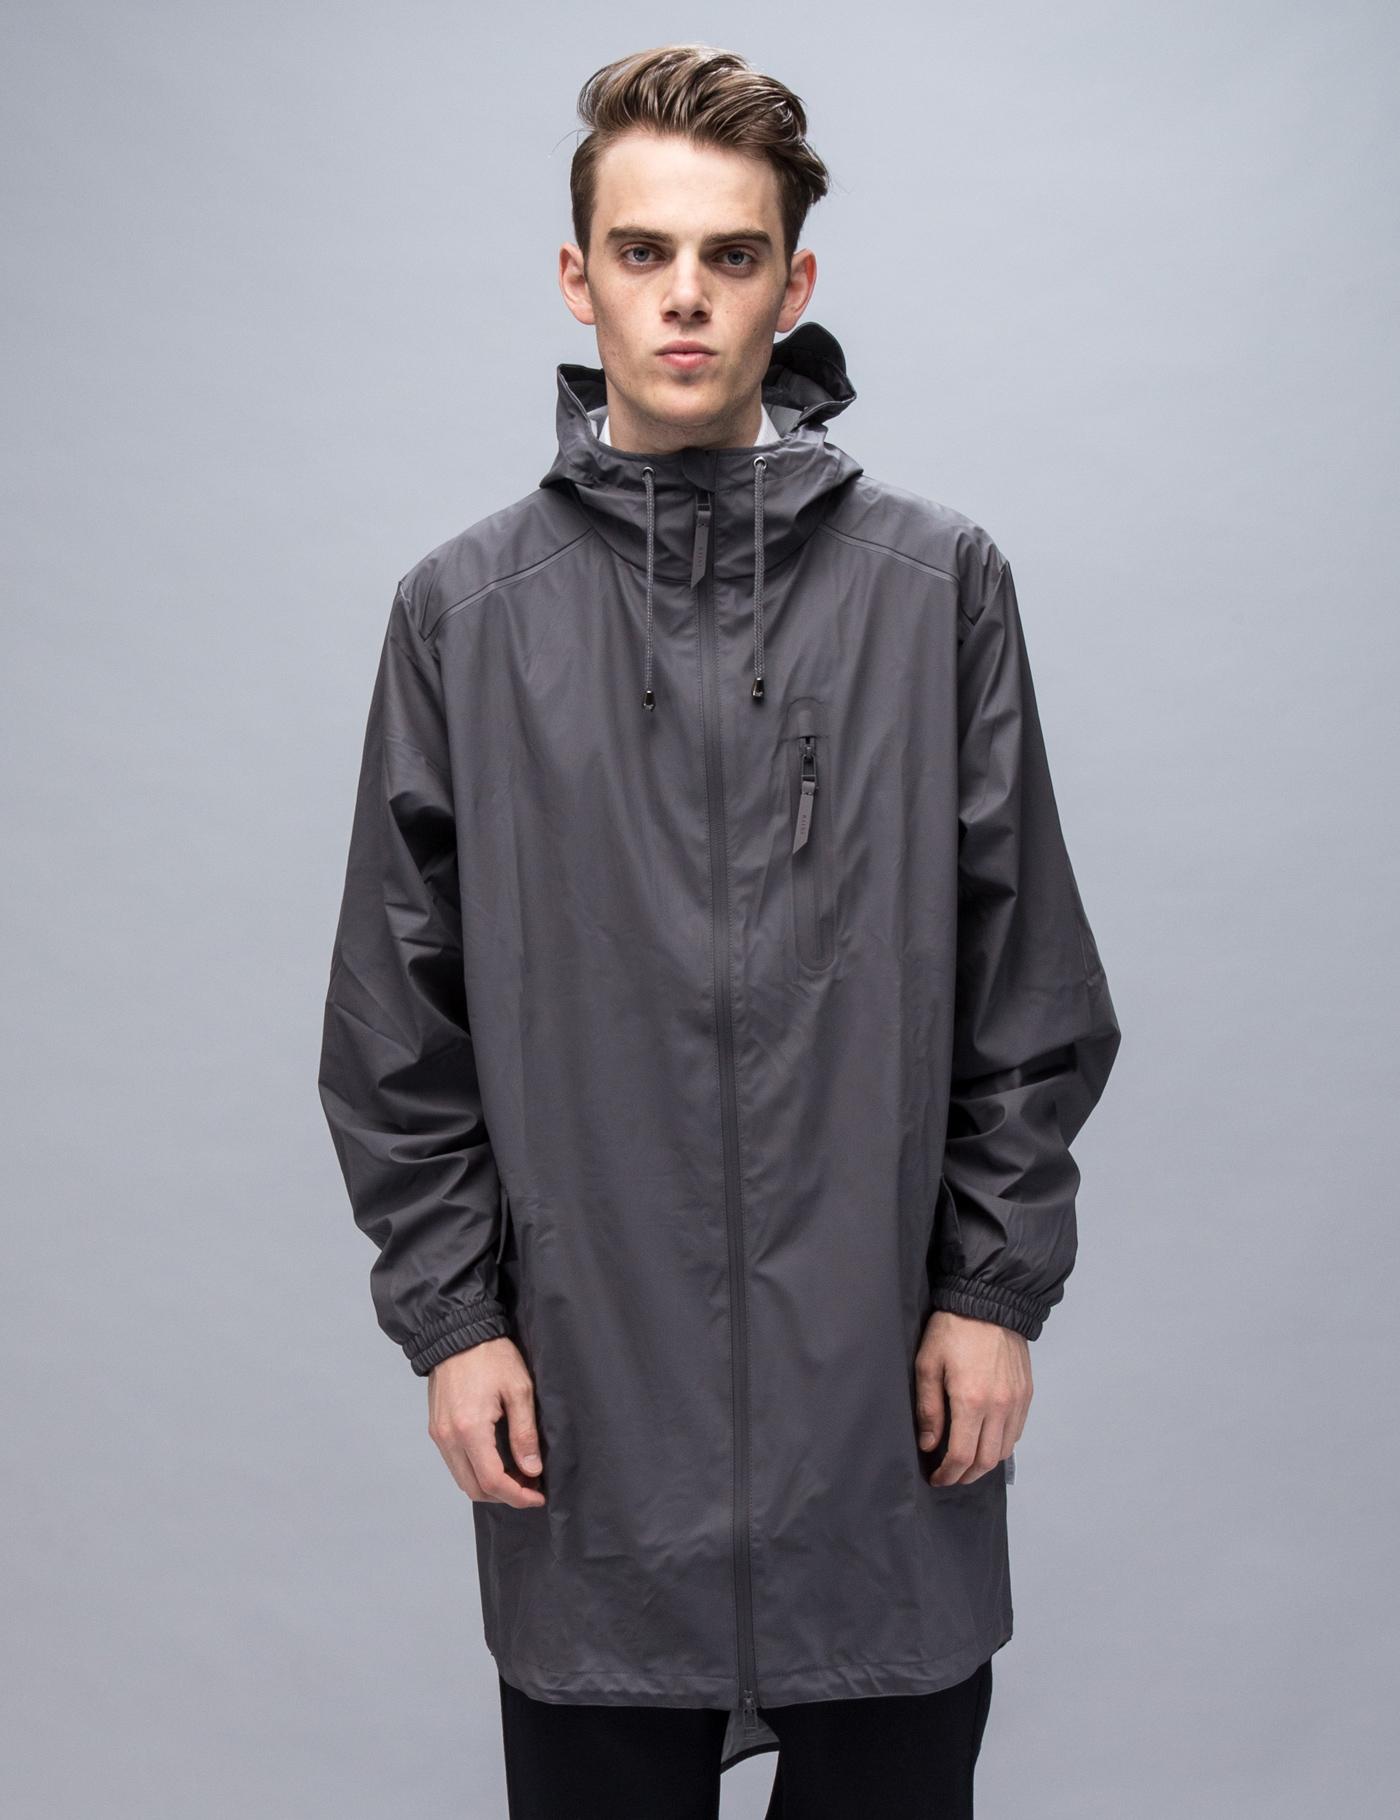 RAINS Grey Parka Coat | HBX.